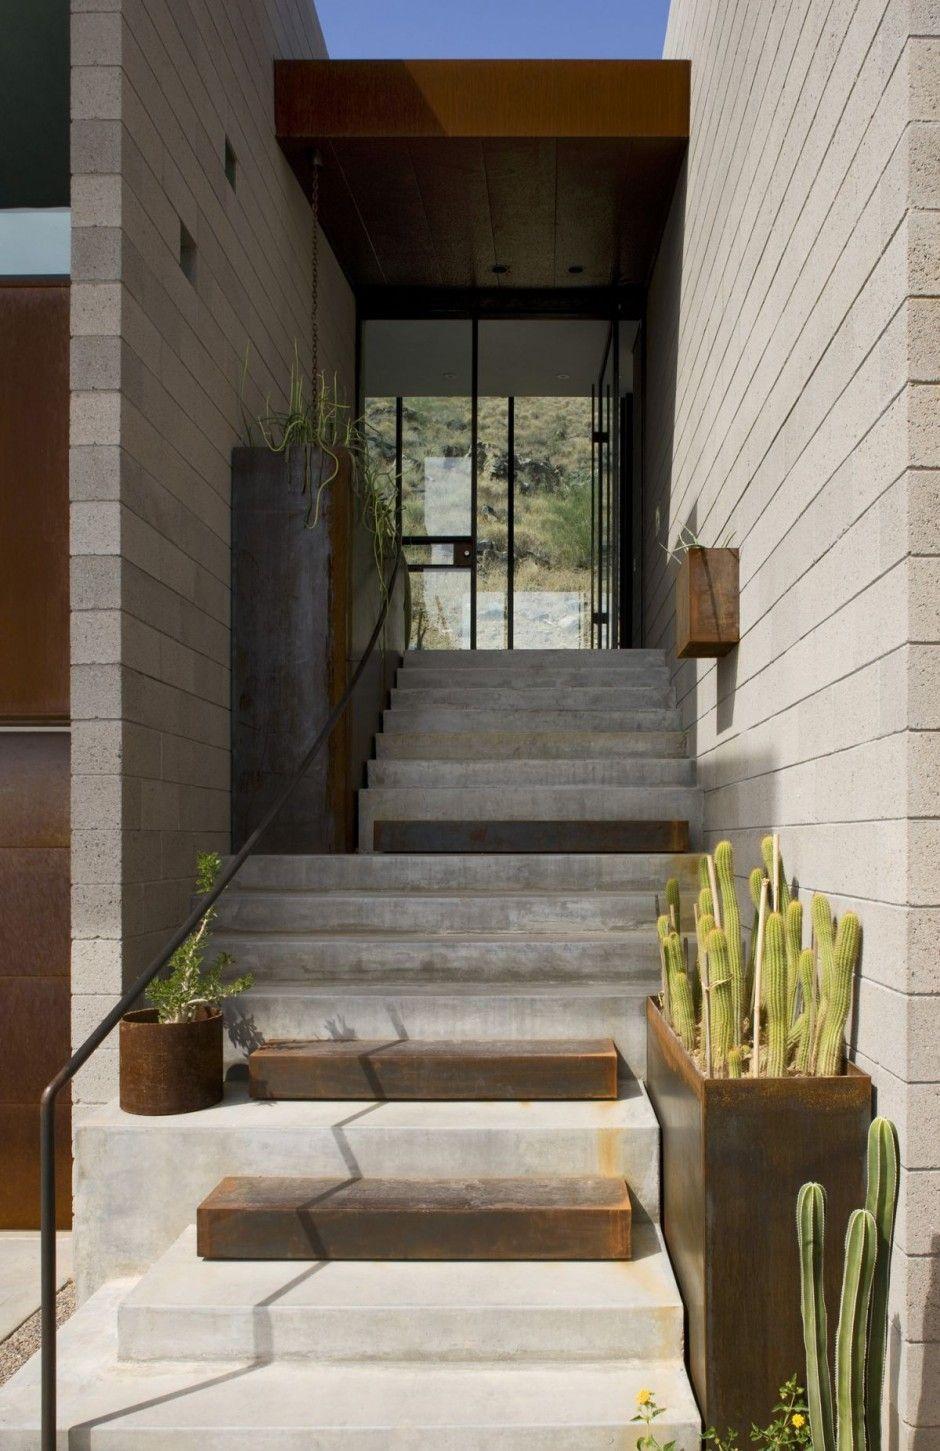 Modern Dream Homes: The Mummy Mountain Residence by Chen + Suchart Studio